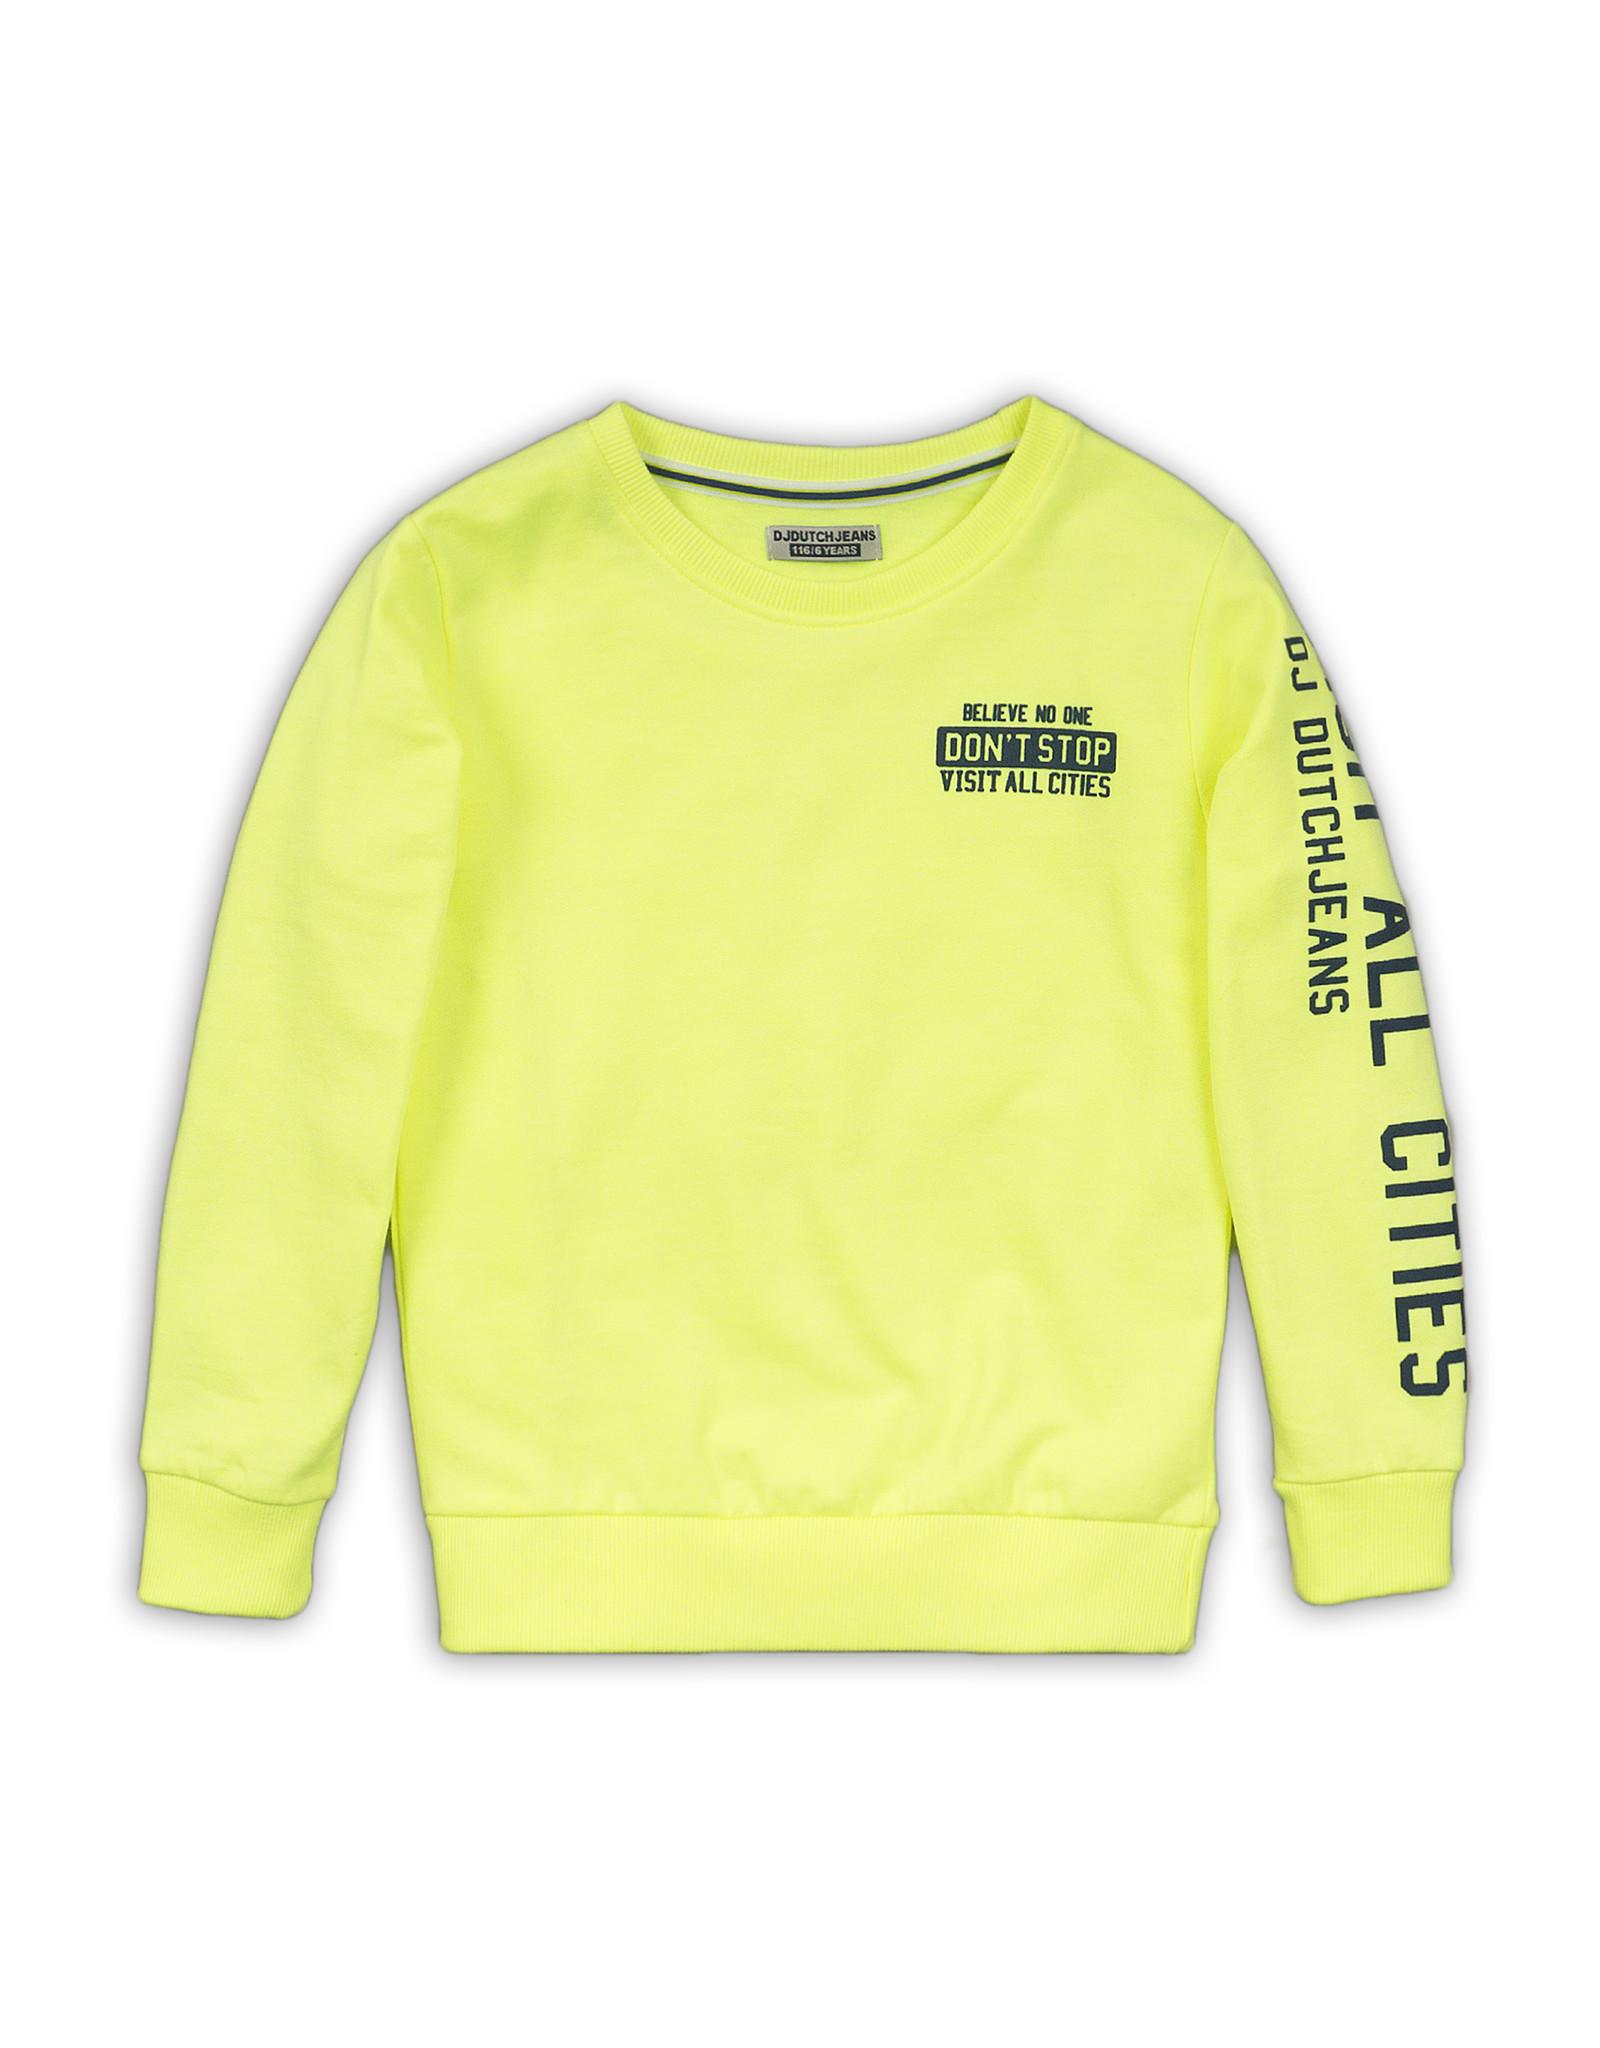 Dutch Jeans Sweater, Neon yellow